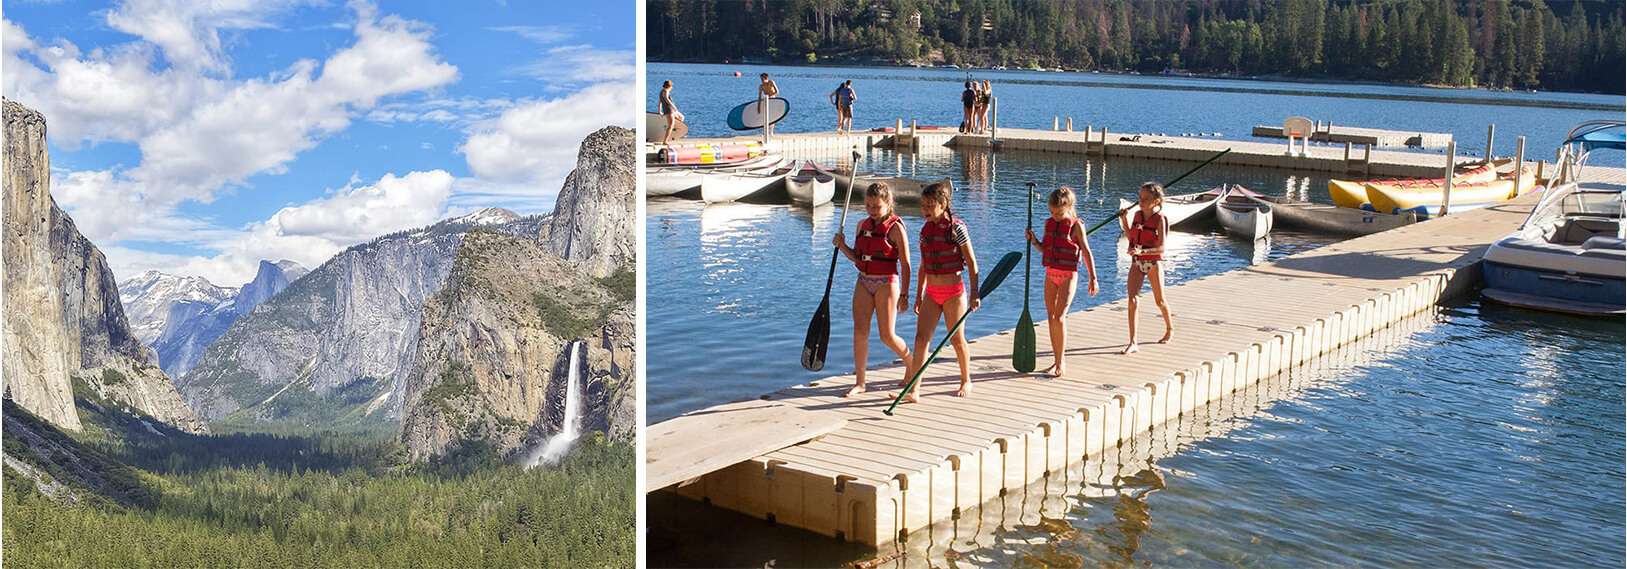 Skylake Yosemite Camp Wishon, CA